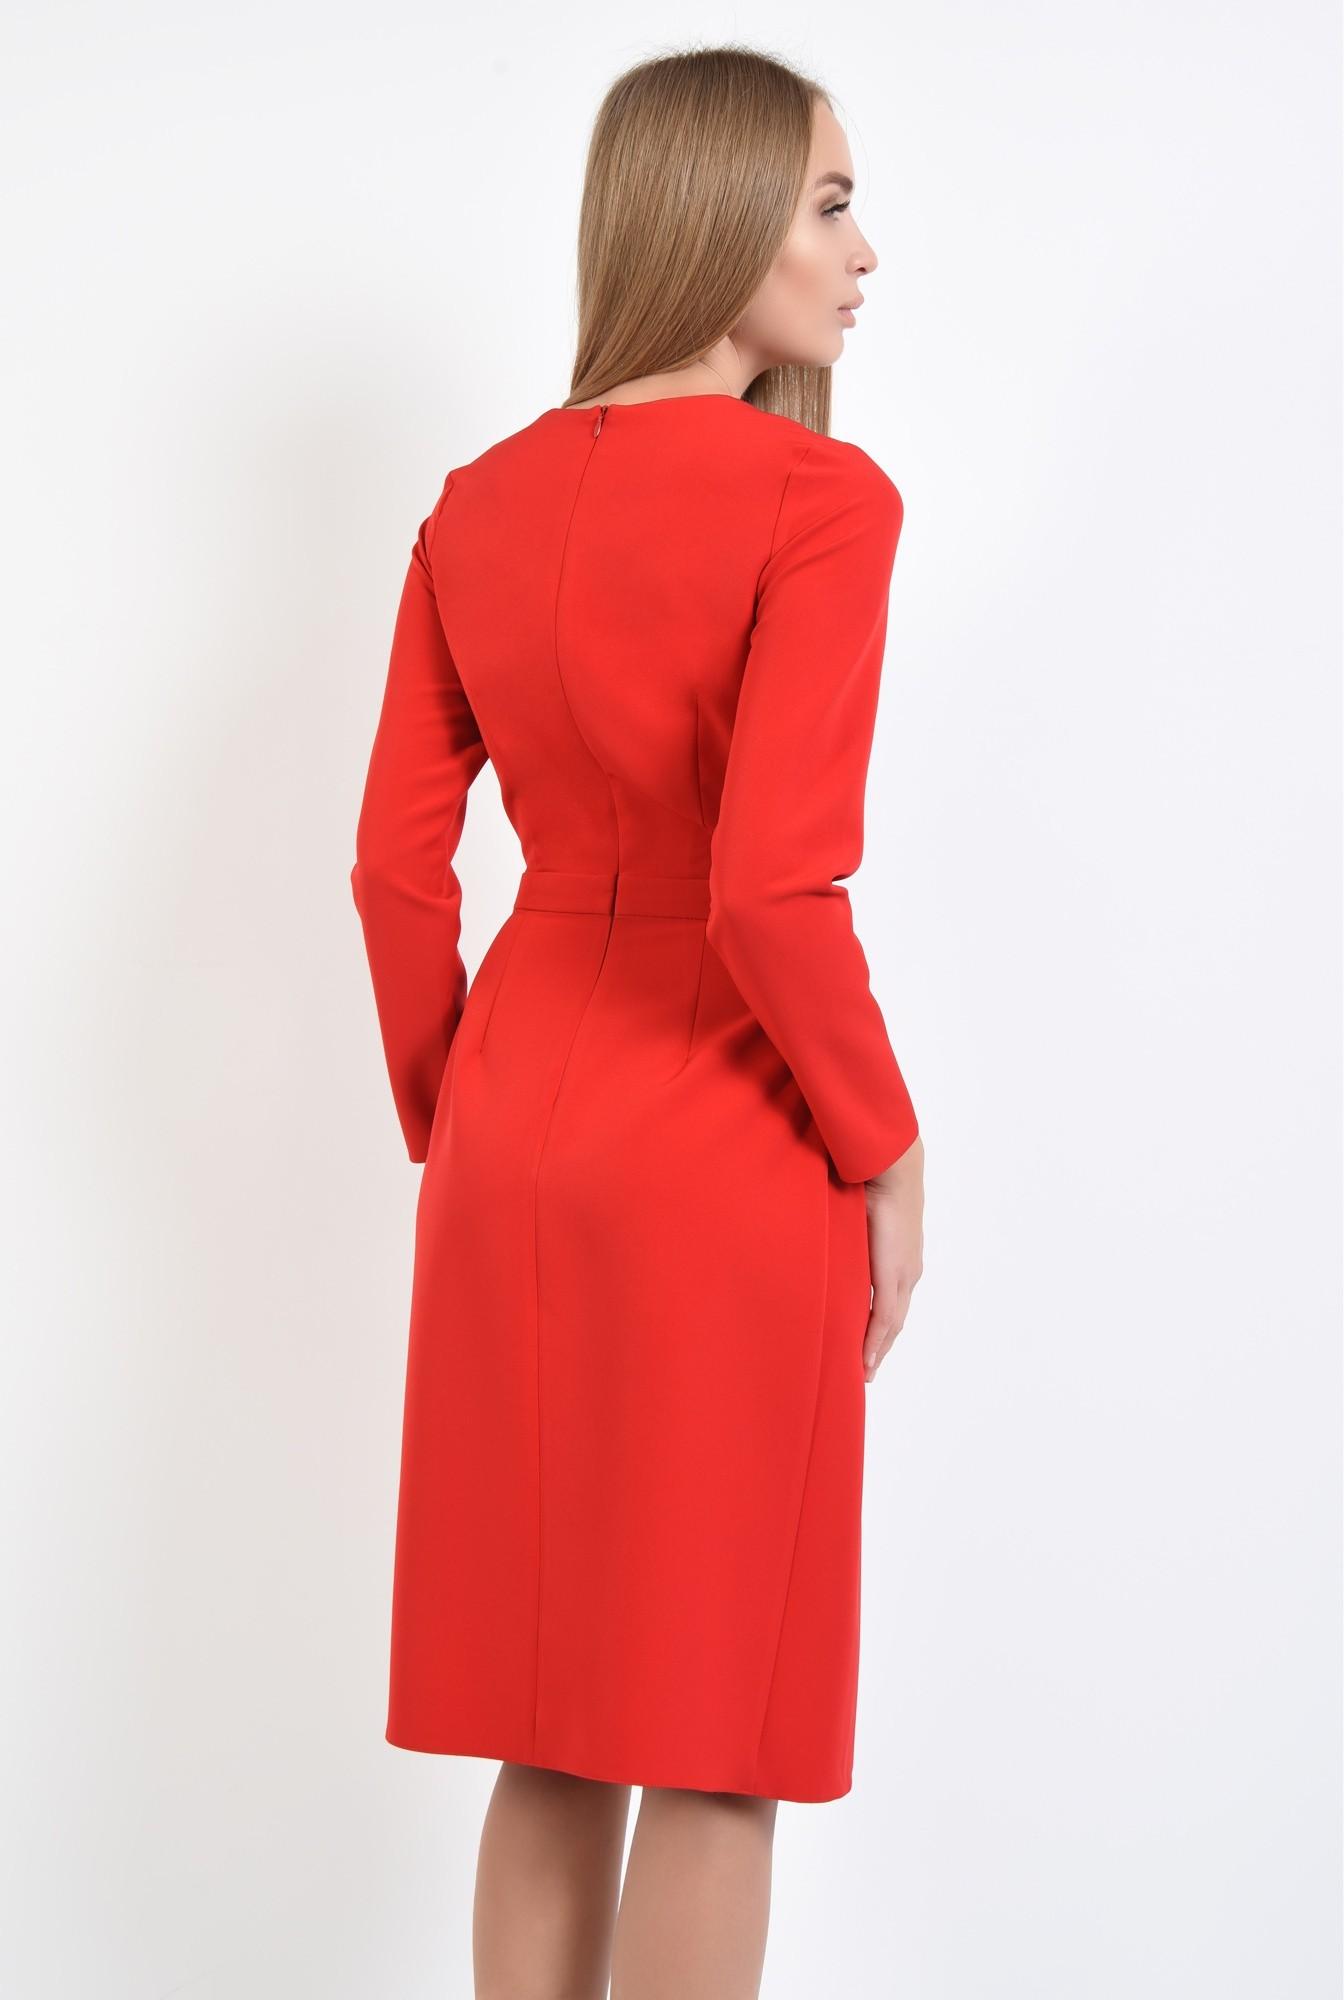 1 - rochii de dama online, betelie, croi evazat, inchidere cu fermoar